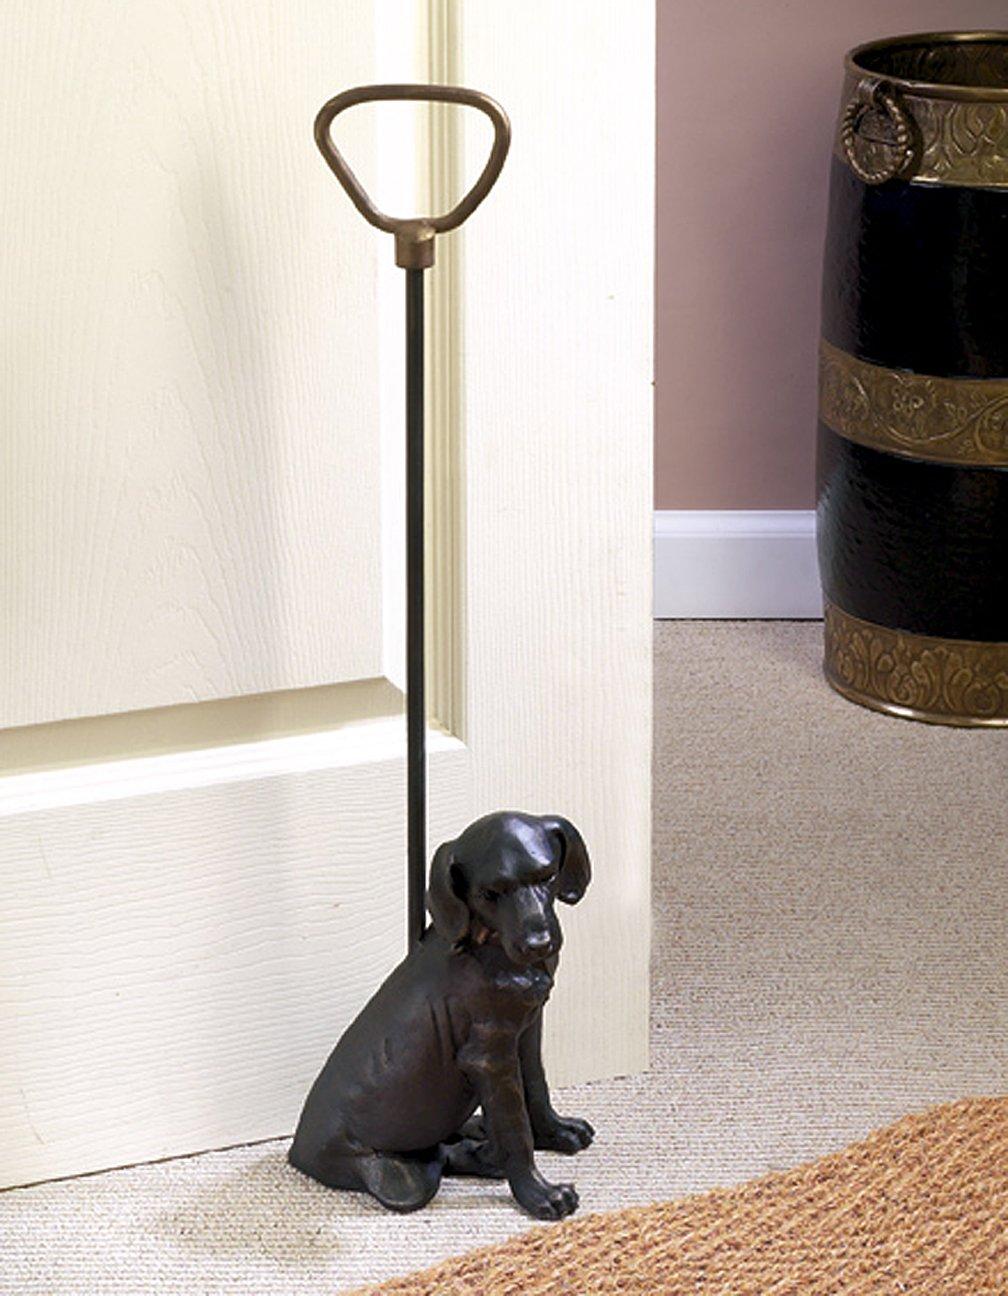 Door Stop - Labrador Retriever Door Stop - Lab Doorstop - Dog Doorstop Lab Door Stop by KensingtonRow Home Collection